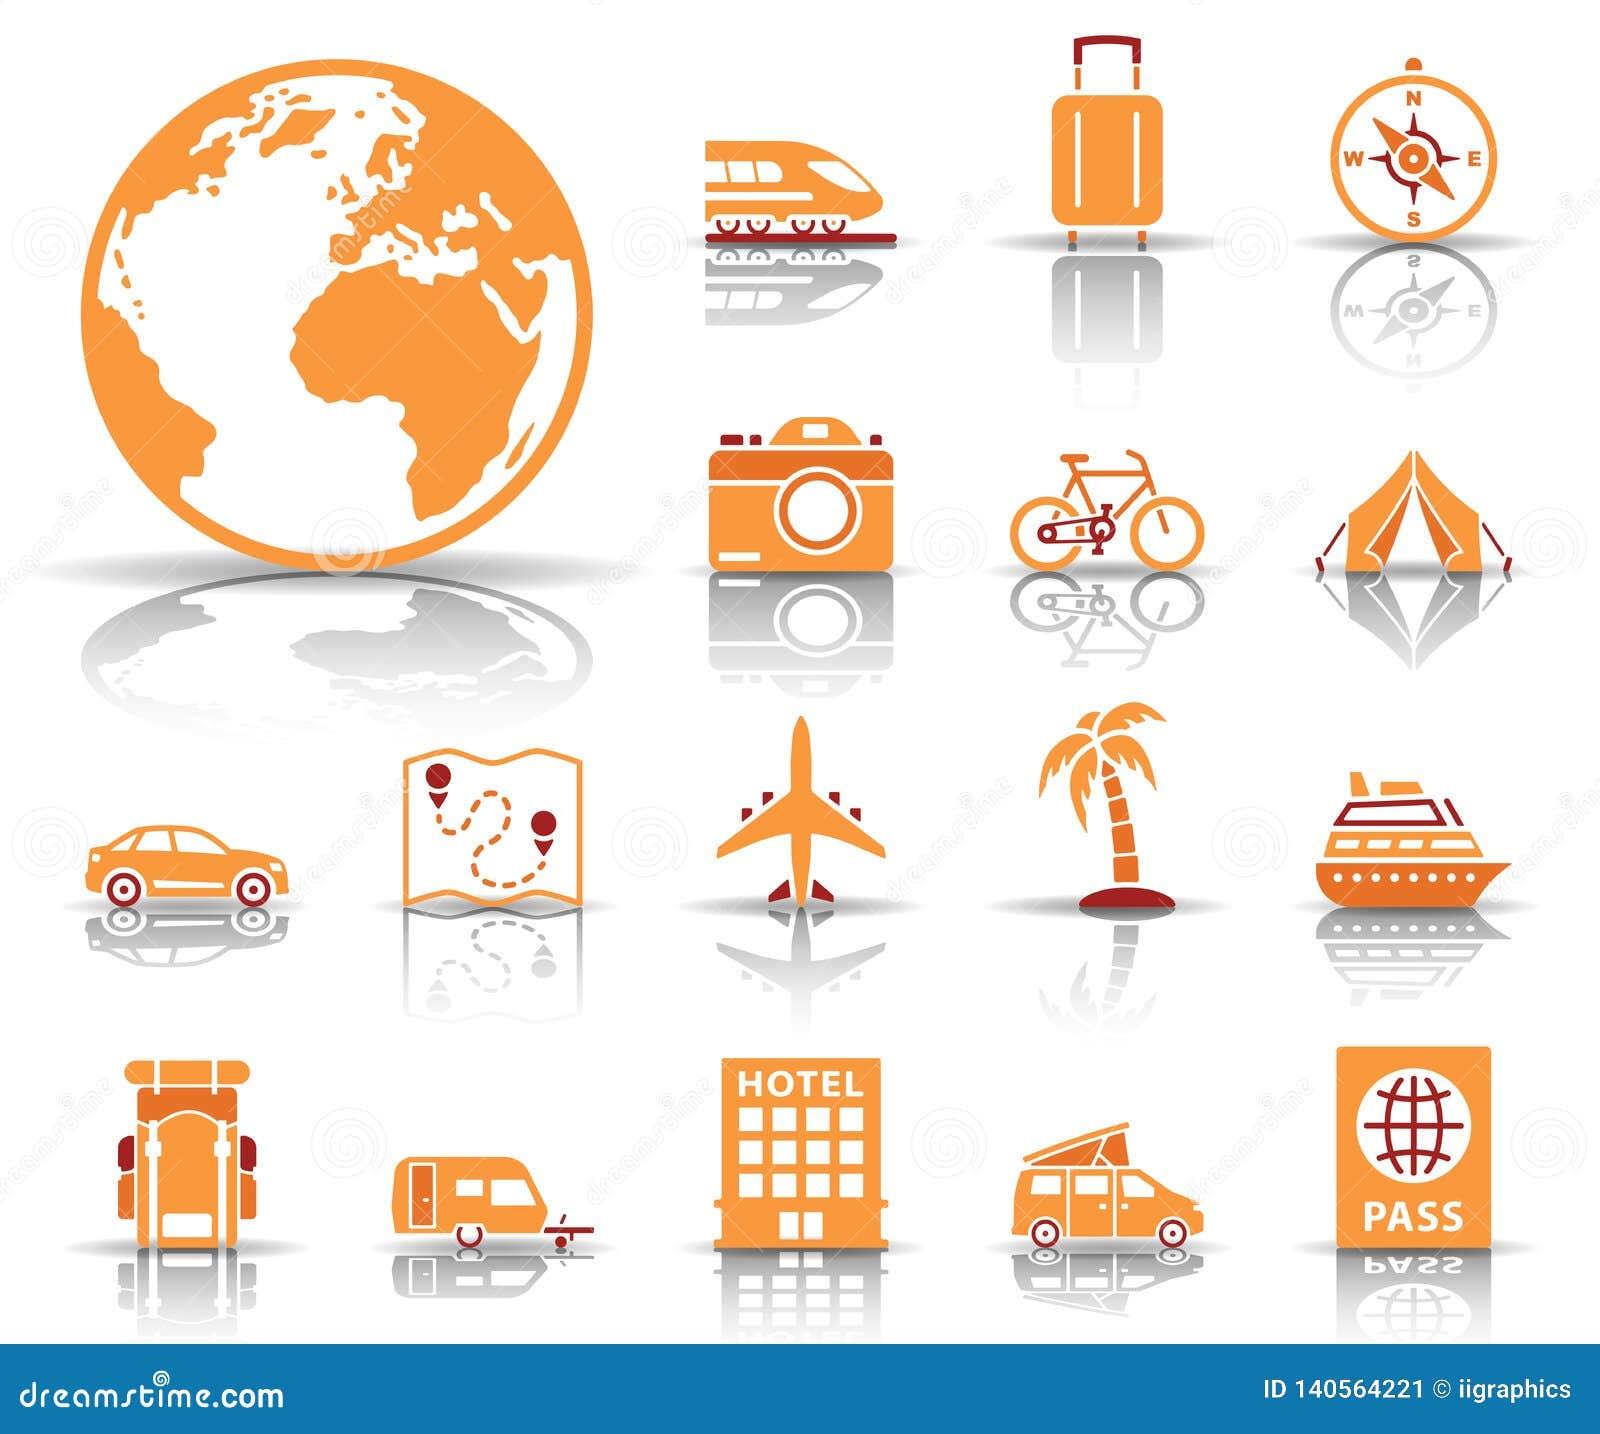 Travel and tourism icon set